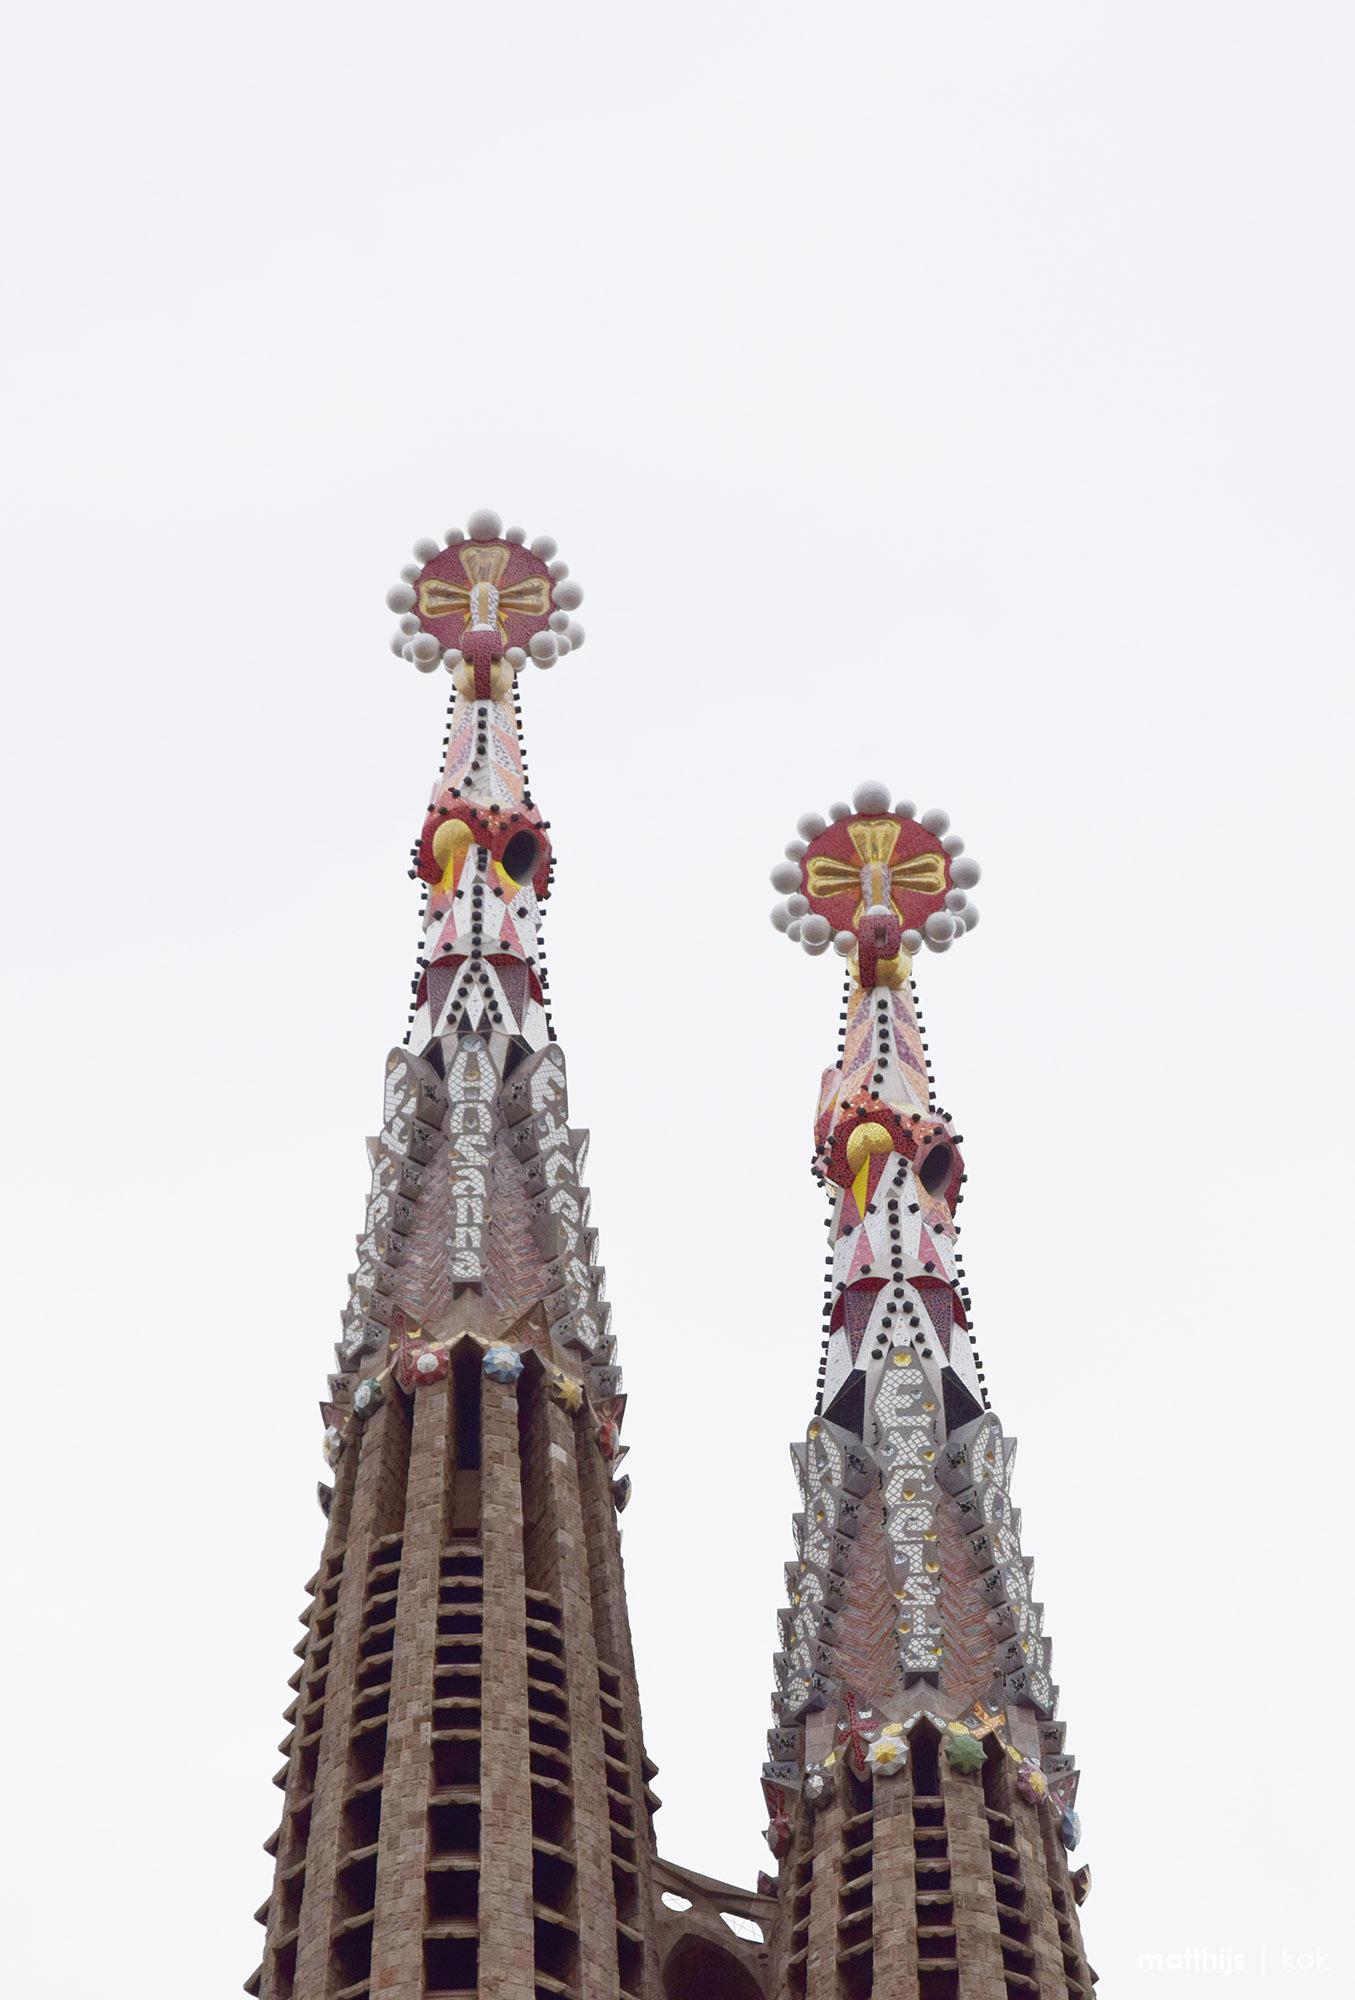 Sagrada Familia, Barcelona, Spain | Photo by Matthijs Kok